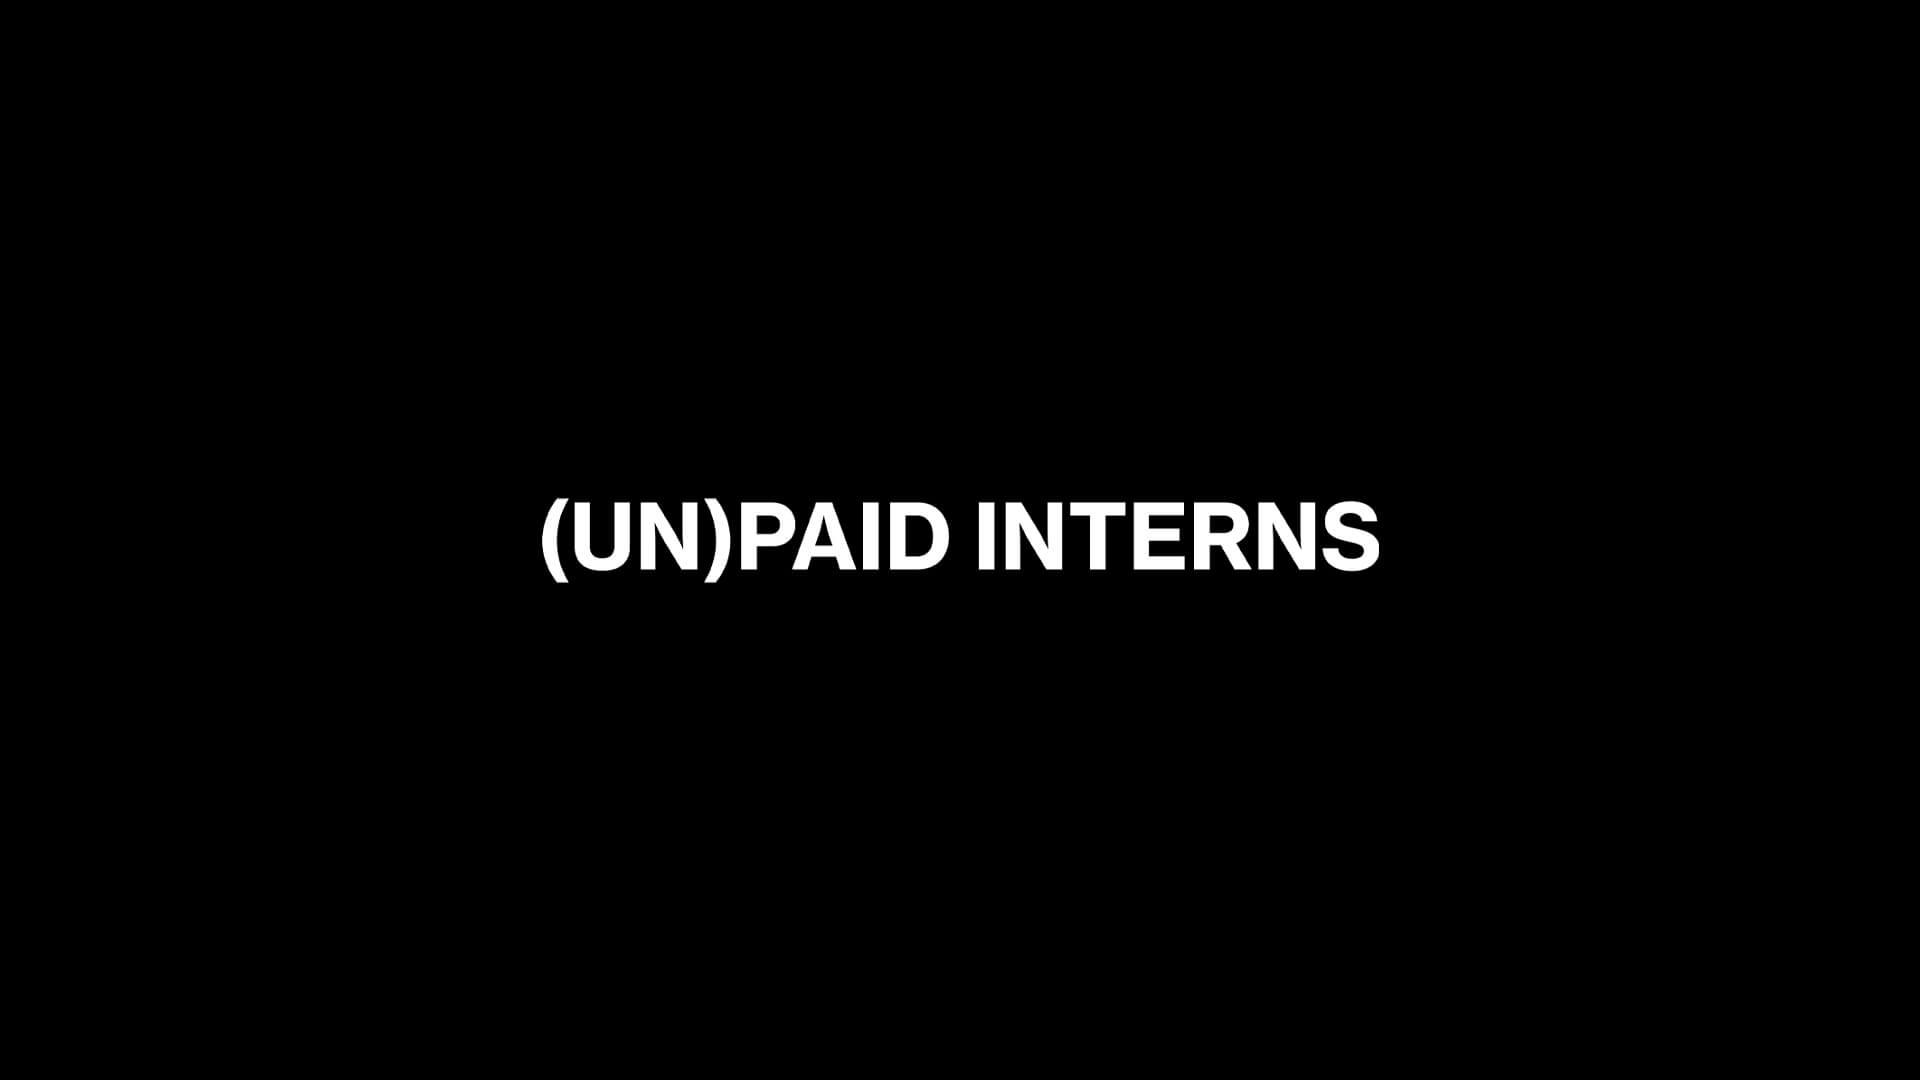 Unpaid Interns Club, 2019